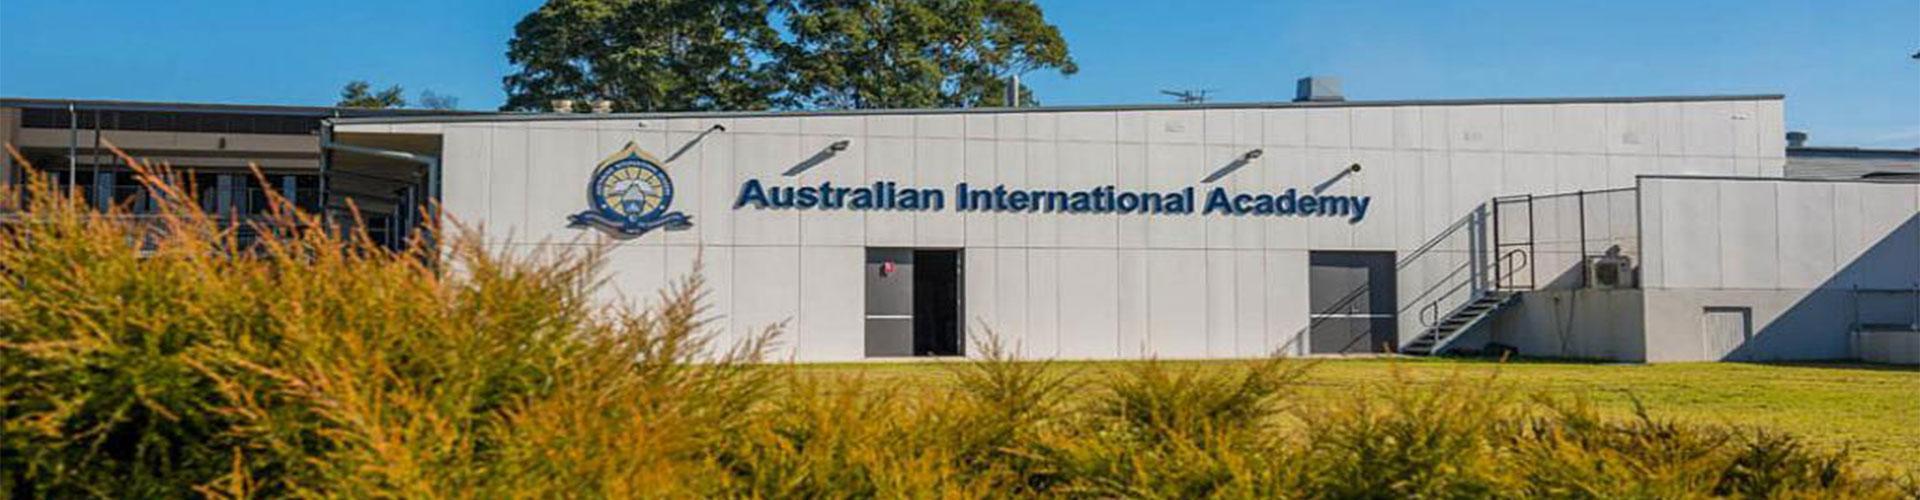 Australasia International